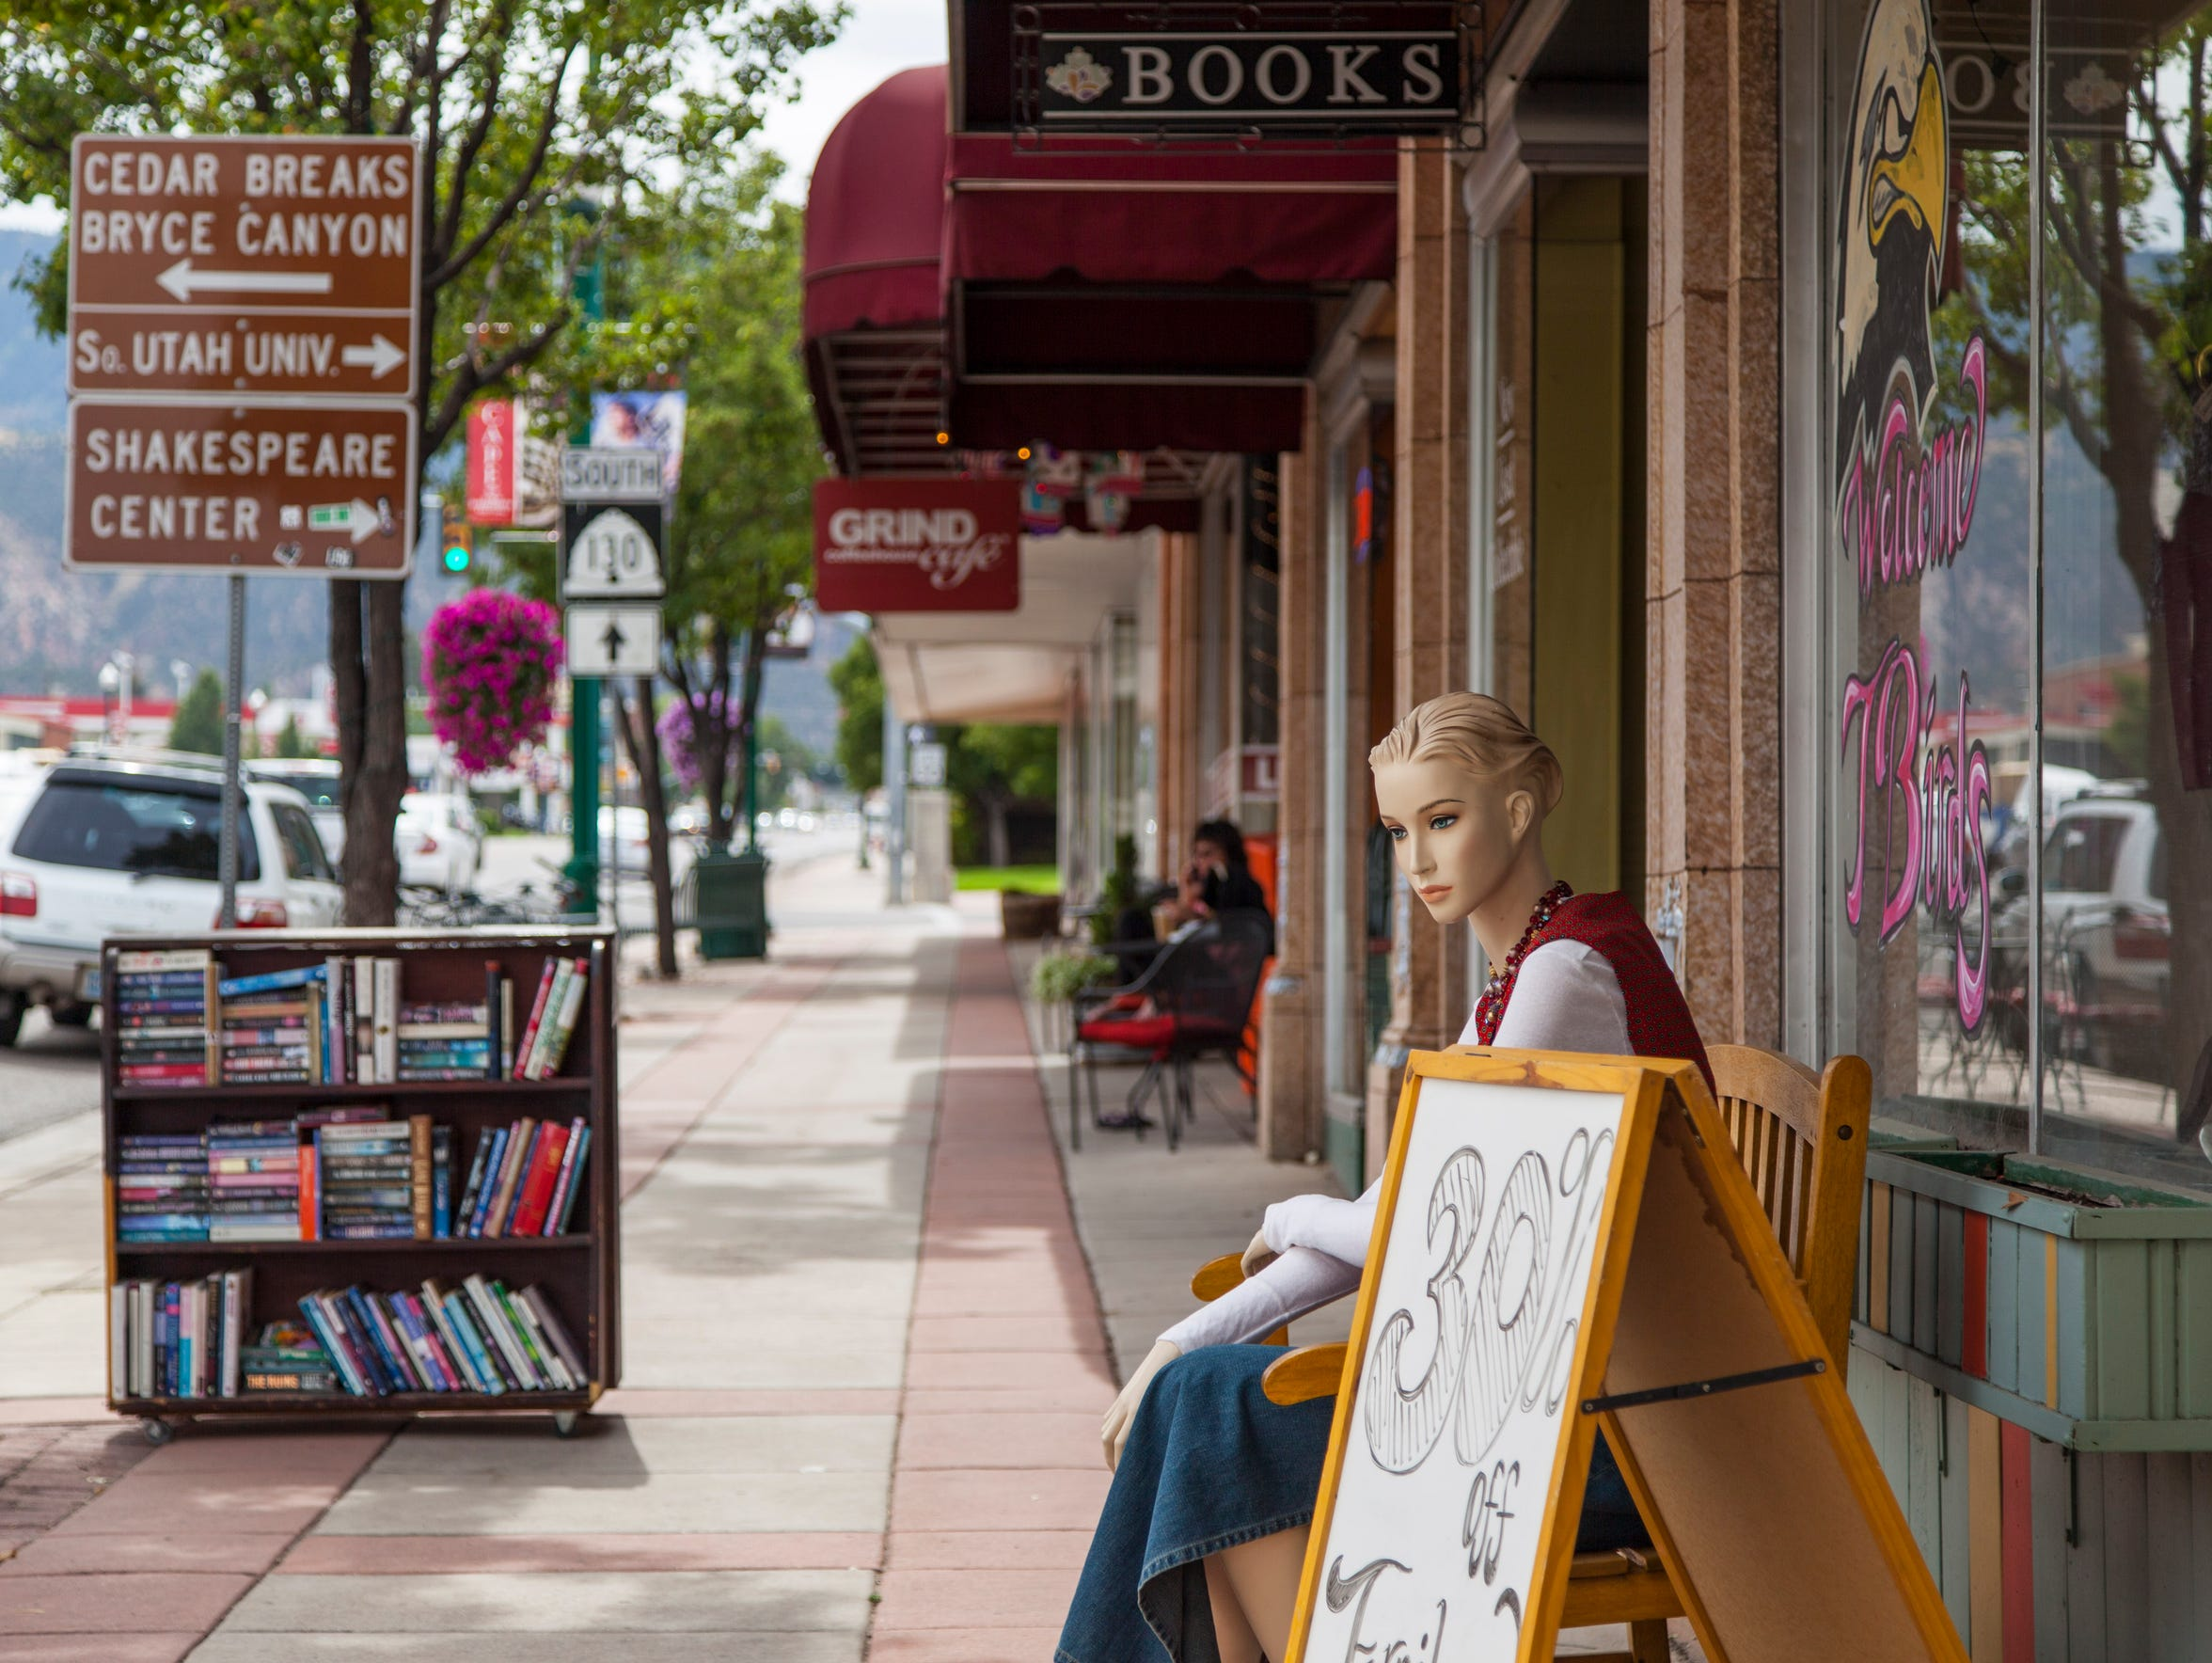 The west sidewalk on Cedar City's Main St. located